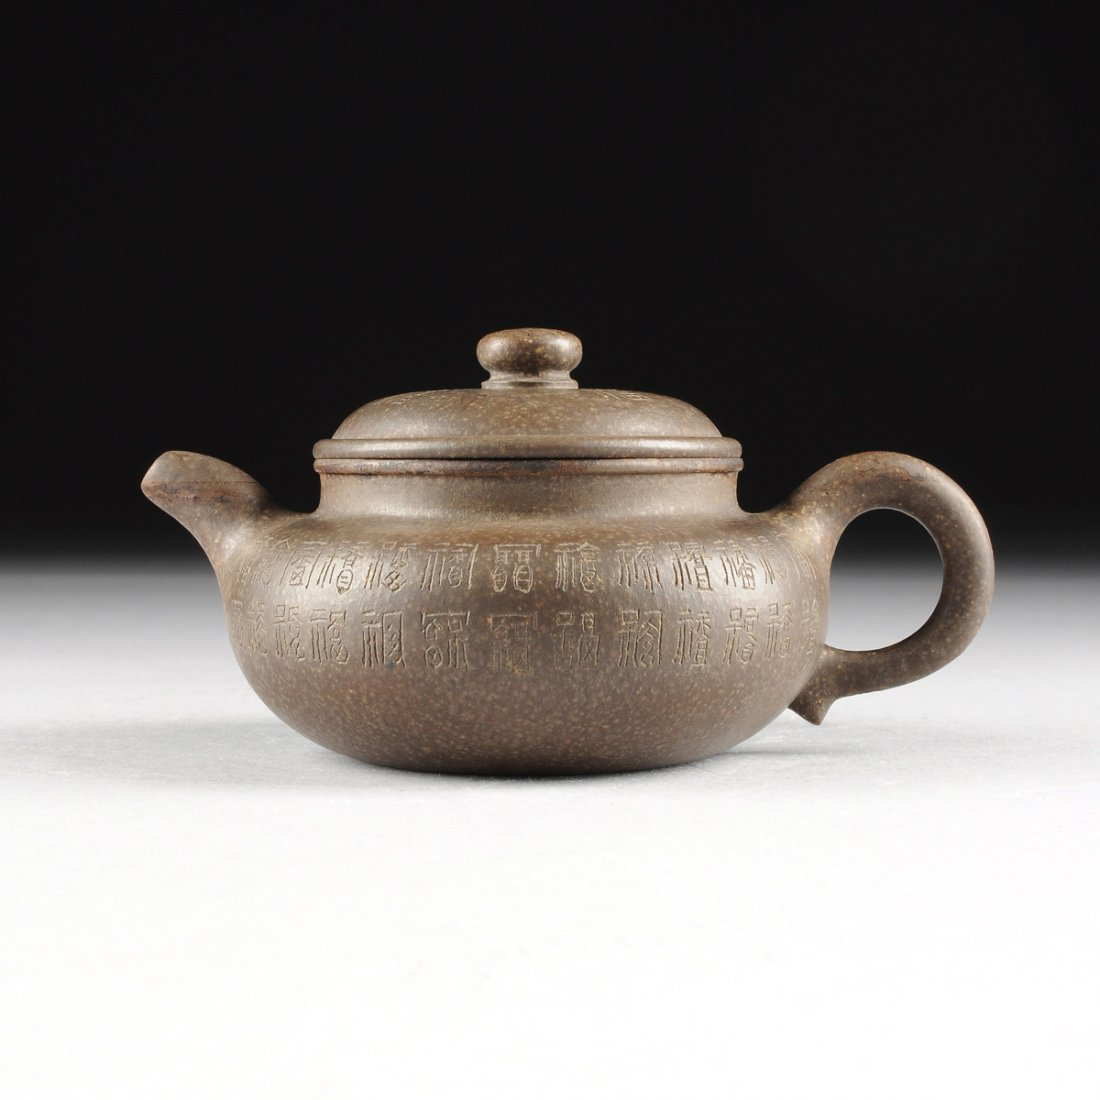 A CHINESE YIXING ZHISA BROWN CERAMIC TEAPOT, IMPRESSED